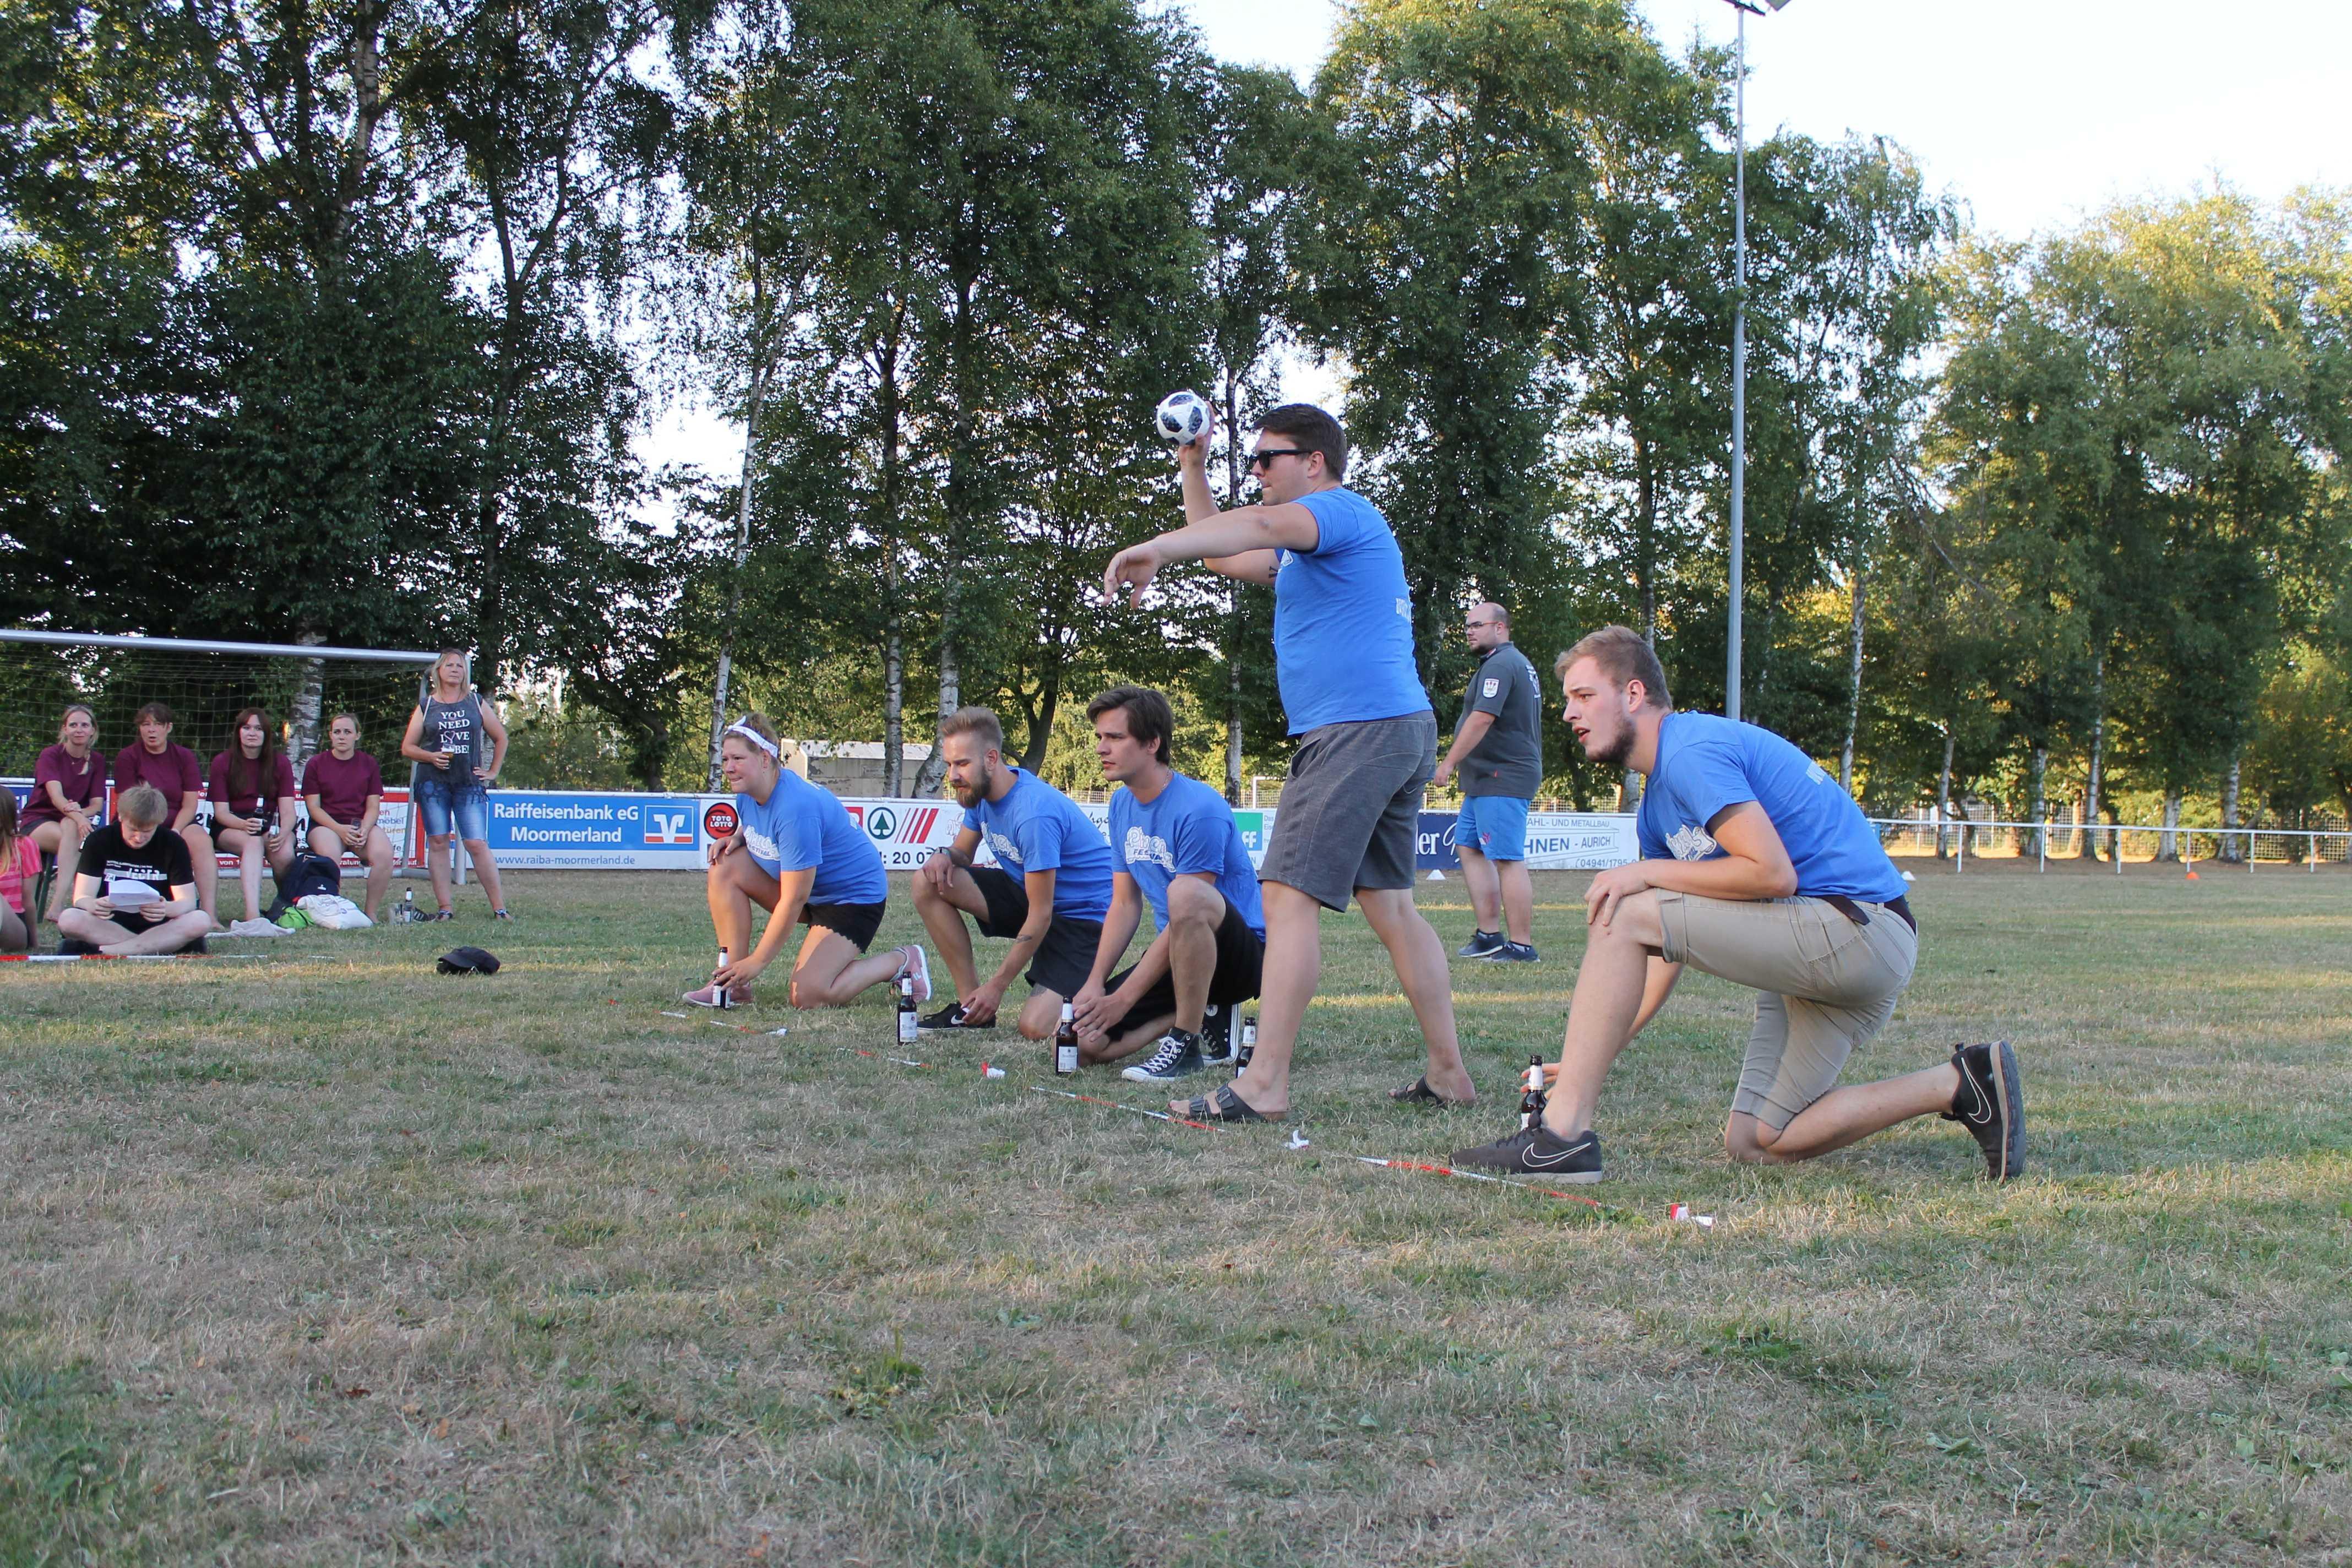 2018-07-27 Sportwoche - Flunkyball Turnier (47)